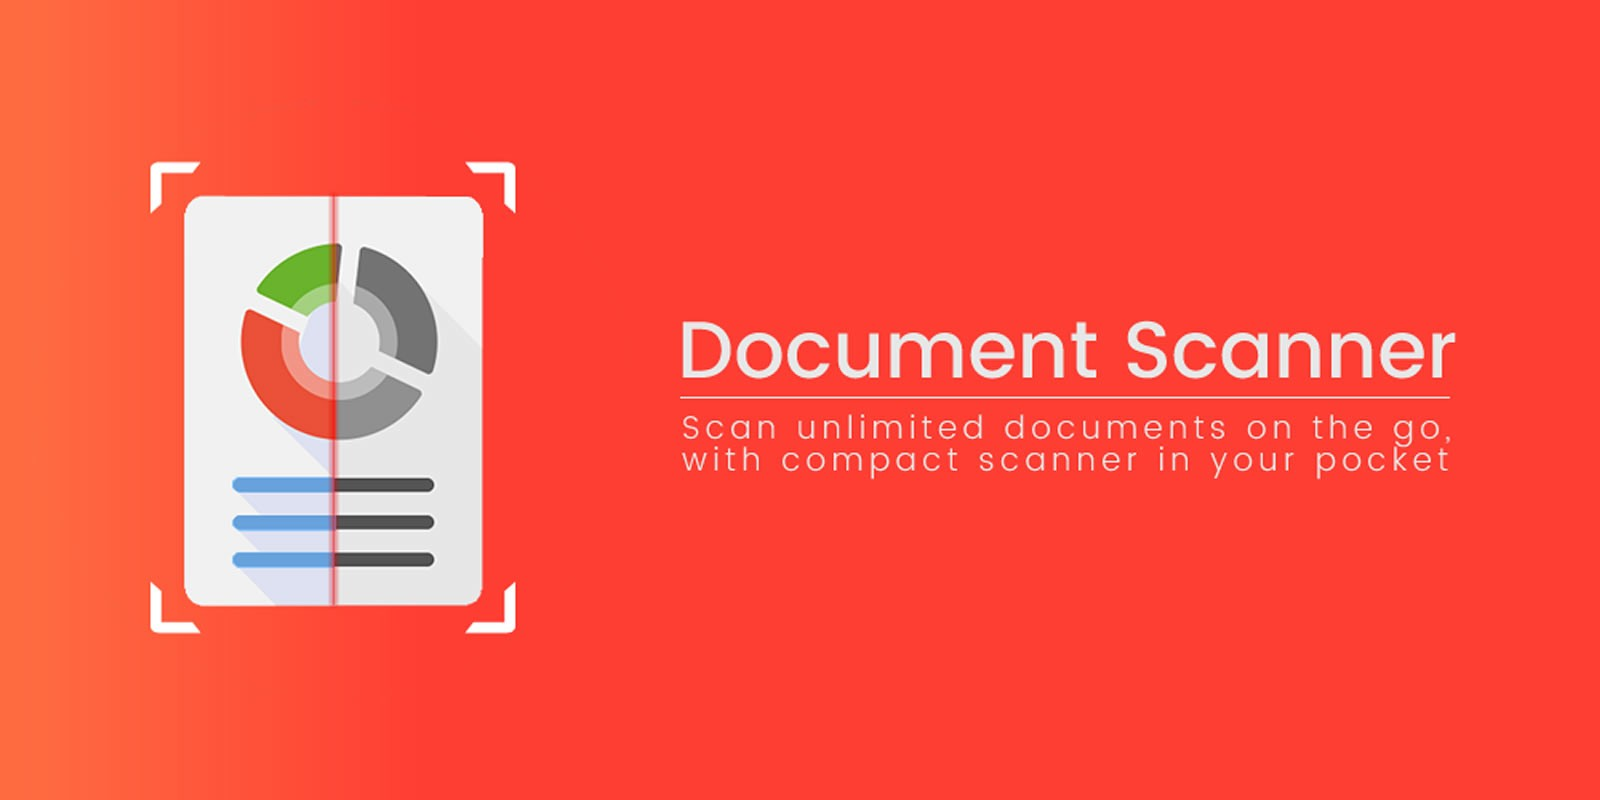 Document Scanner App - iOS Source Code